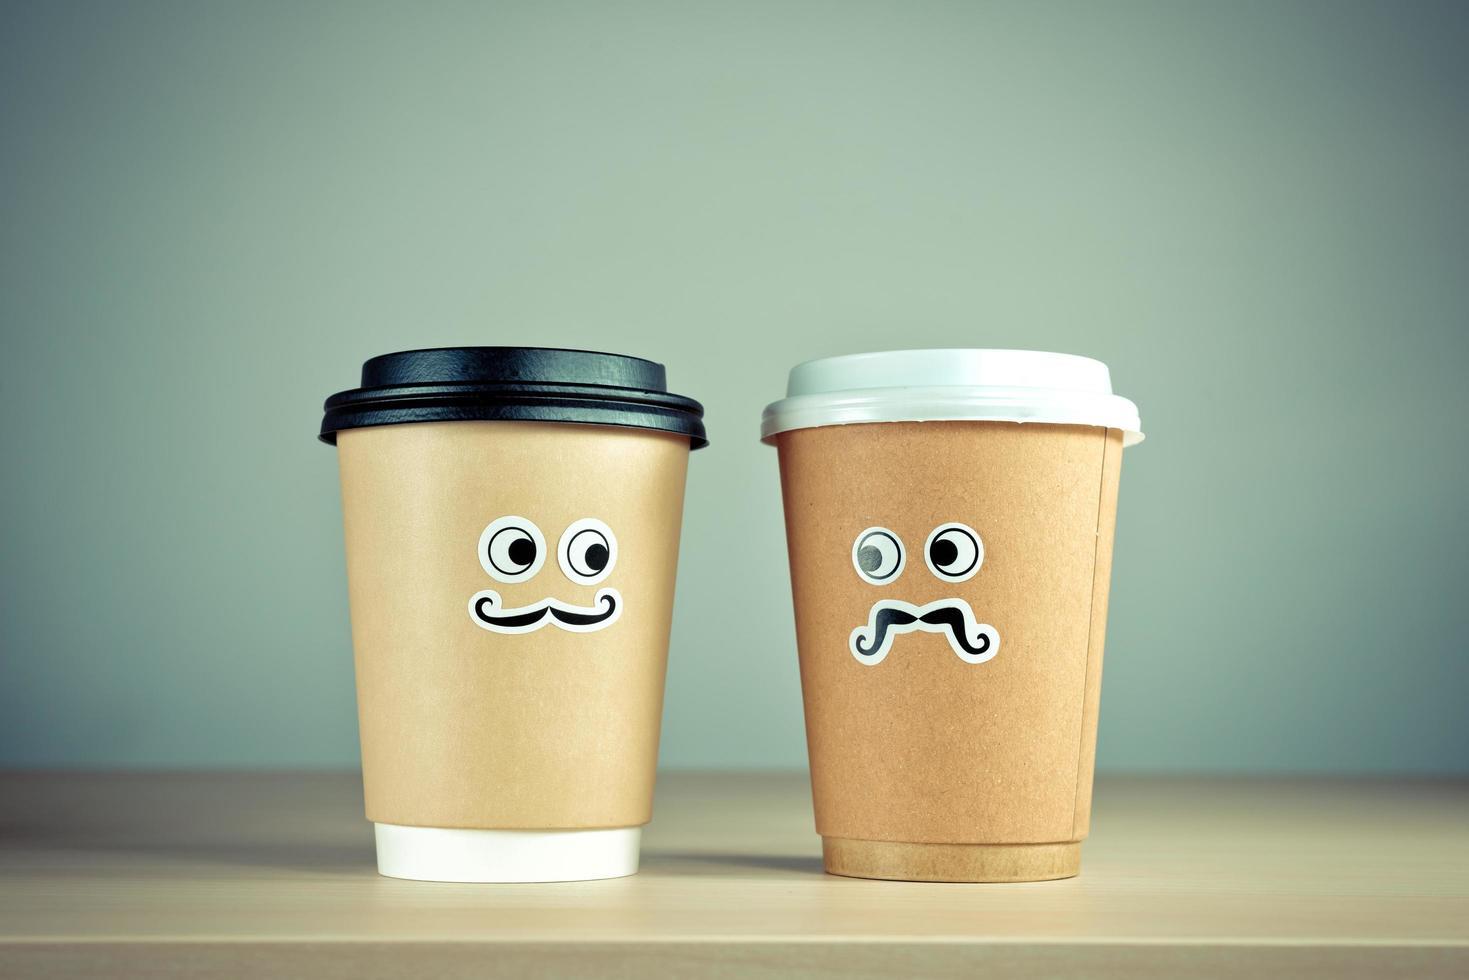 haal koffiekopkarakters weg foto